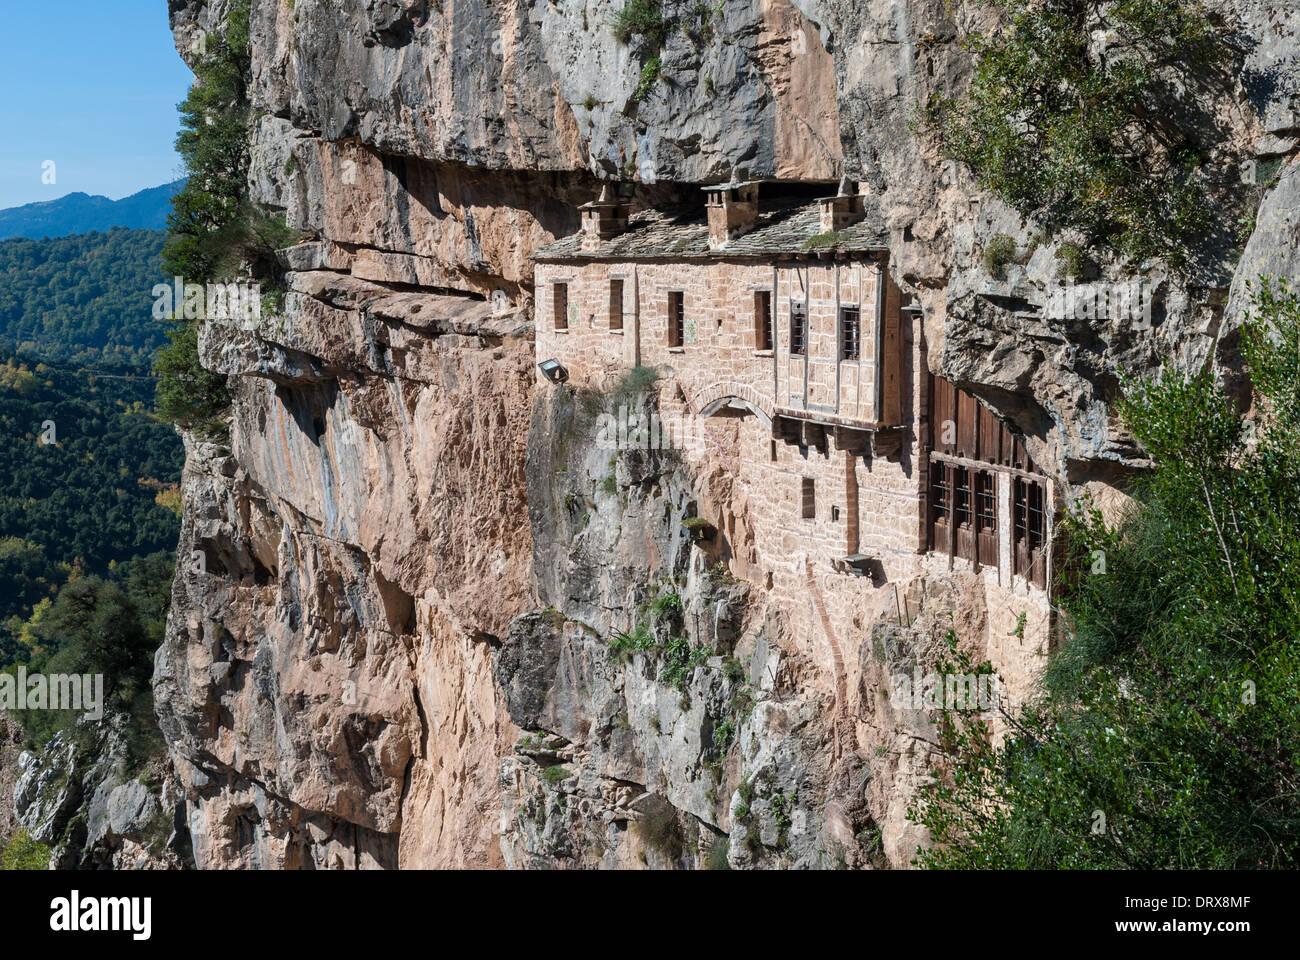 The historic Kipina Monastery (12th century), built on a cliff of the Tzoumerka mountains in Epirus, Greece - Stock Image